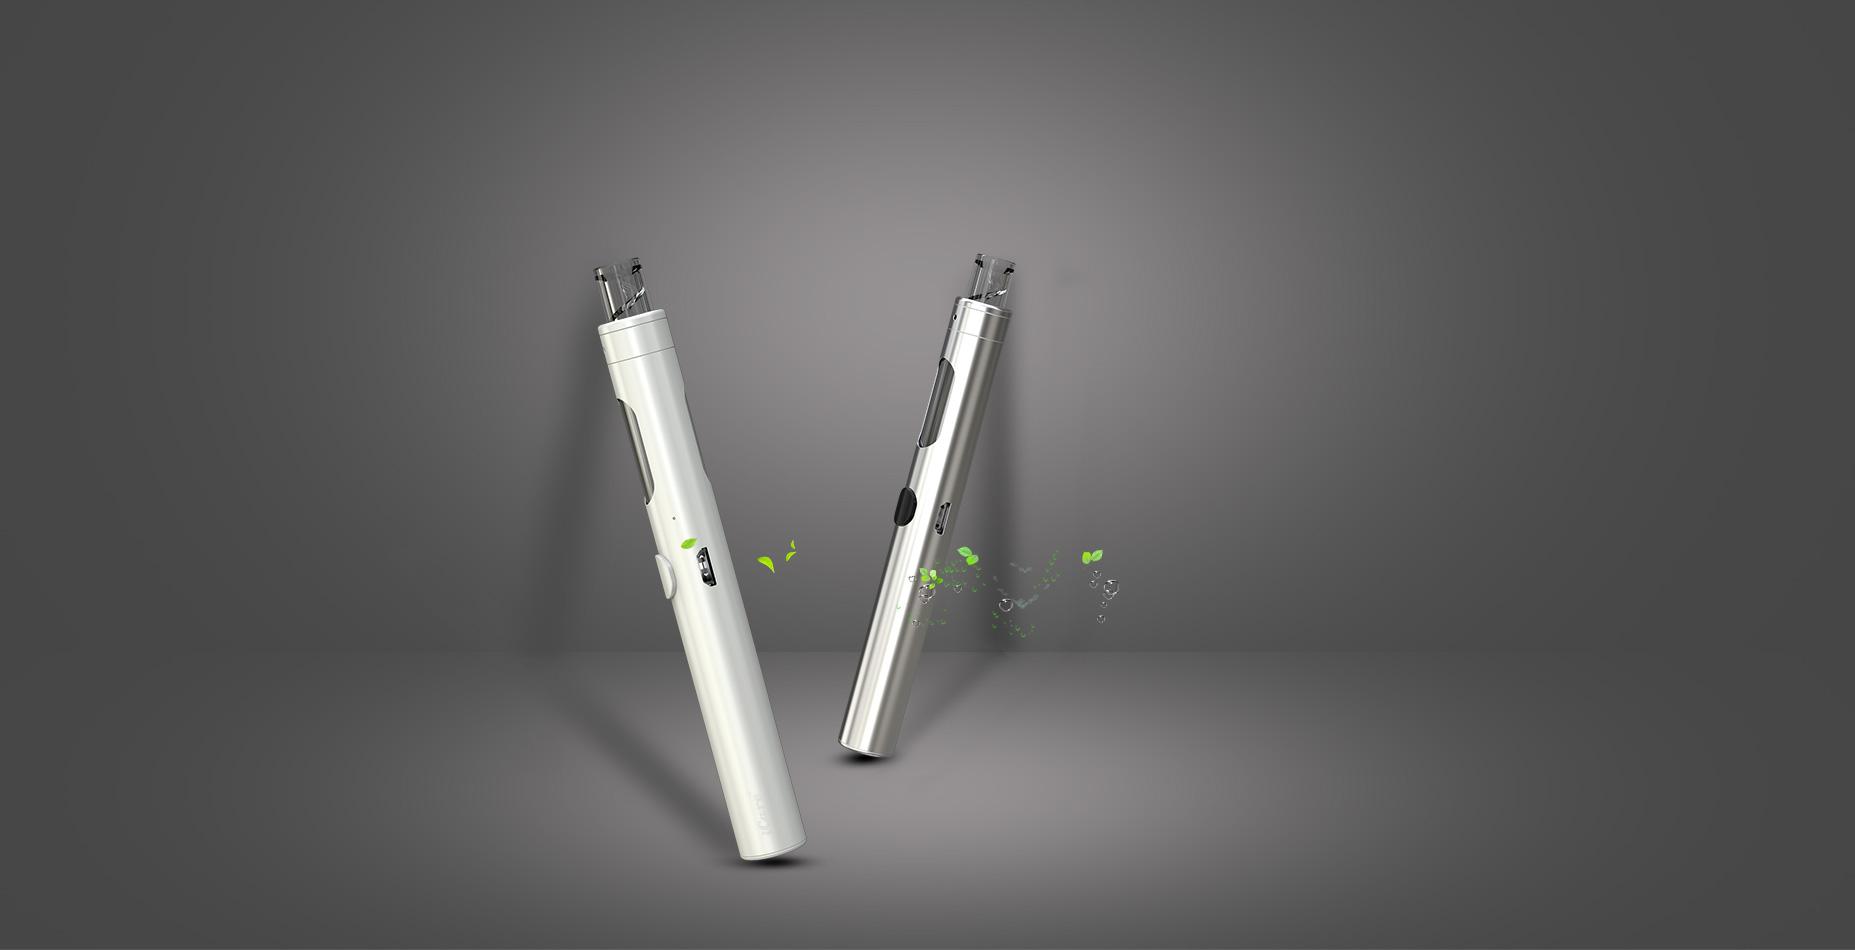 eleaf icare 140 design review